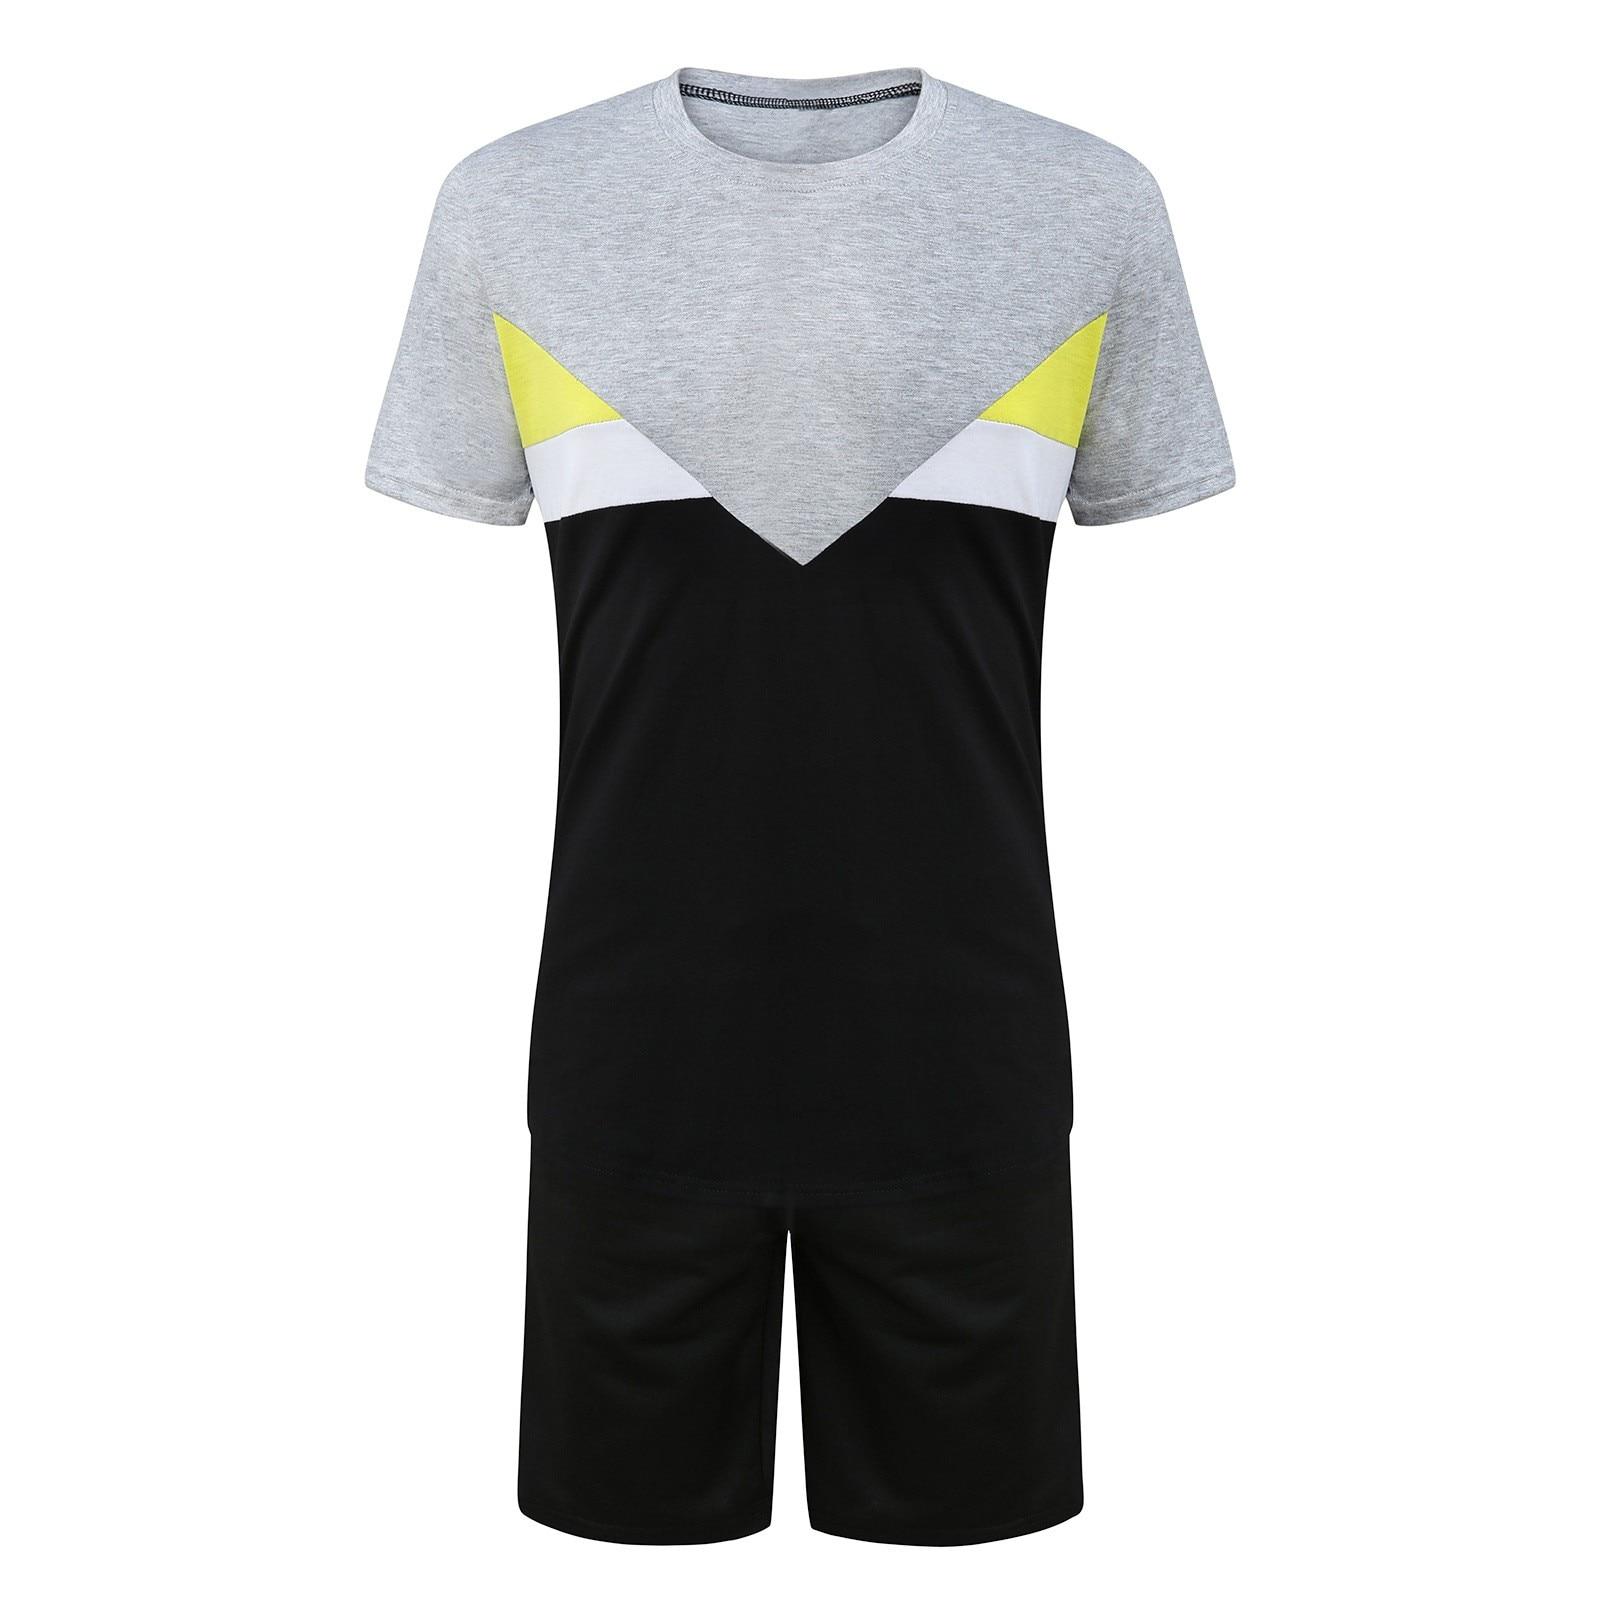 Men s Sets Summer Mens Home Sports Tracksuit Short Sleeve O neck Short Thin Set Breathable